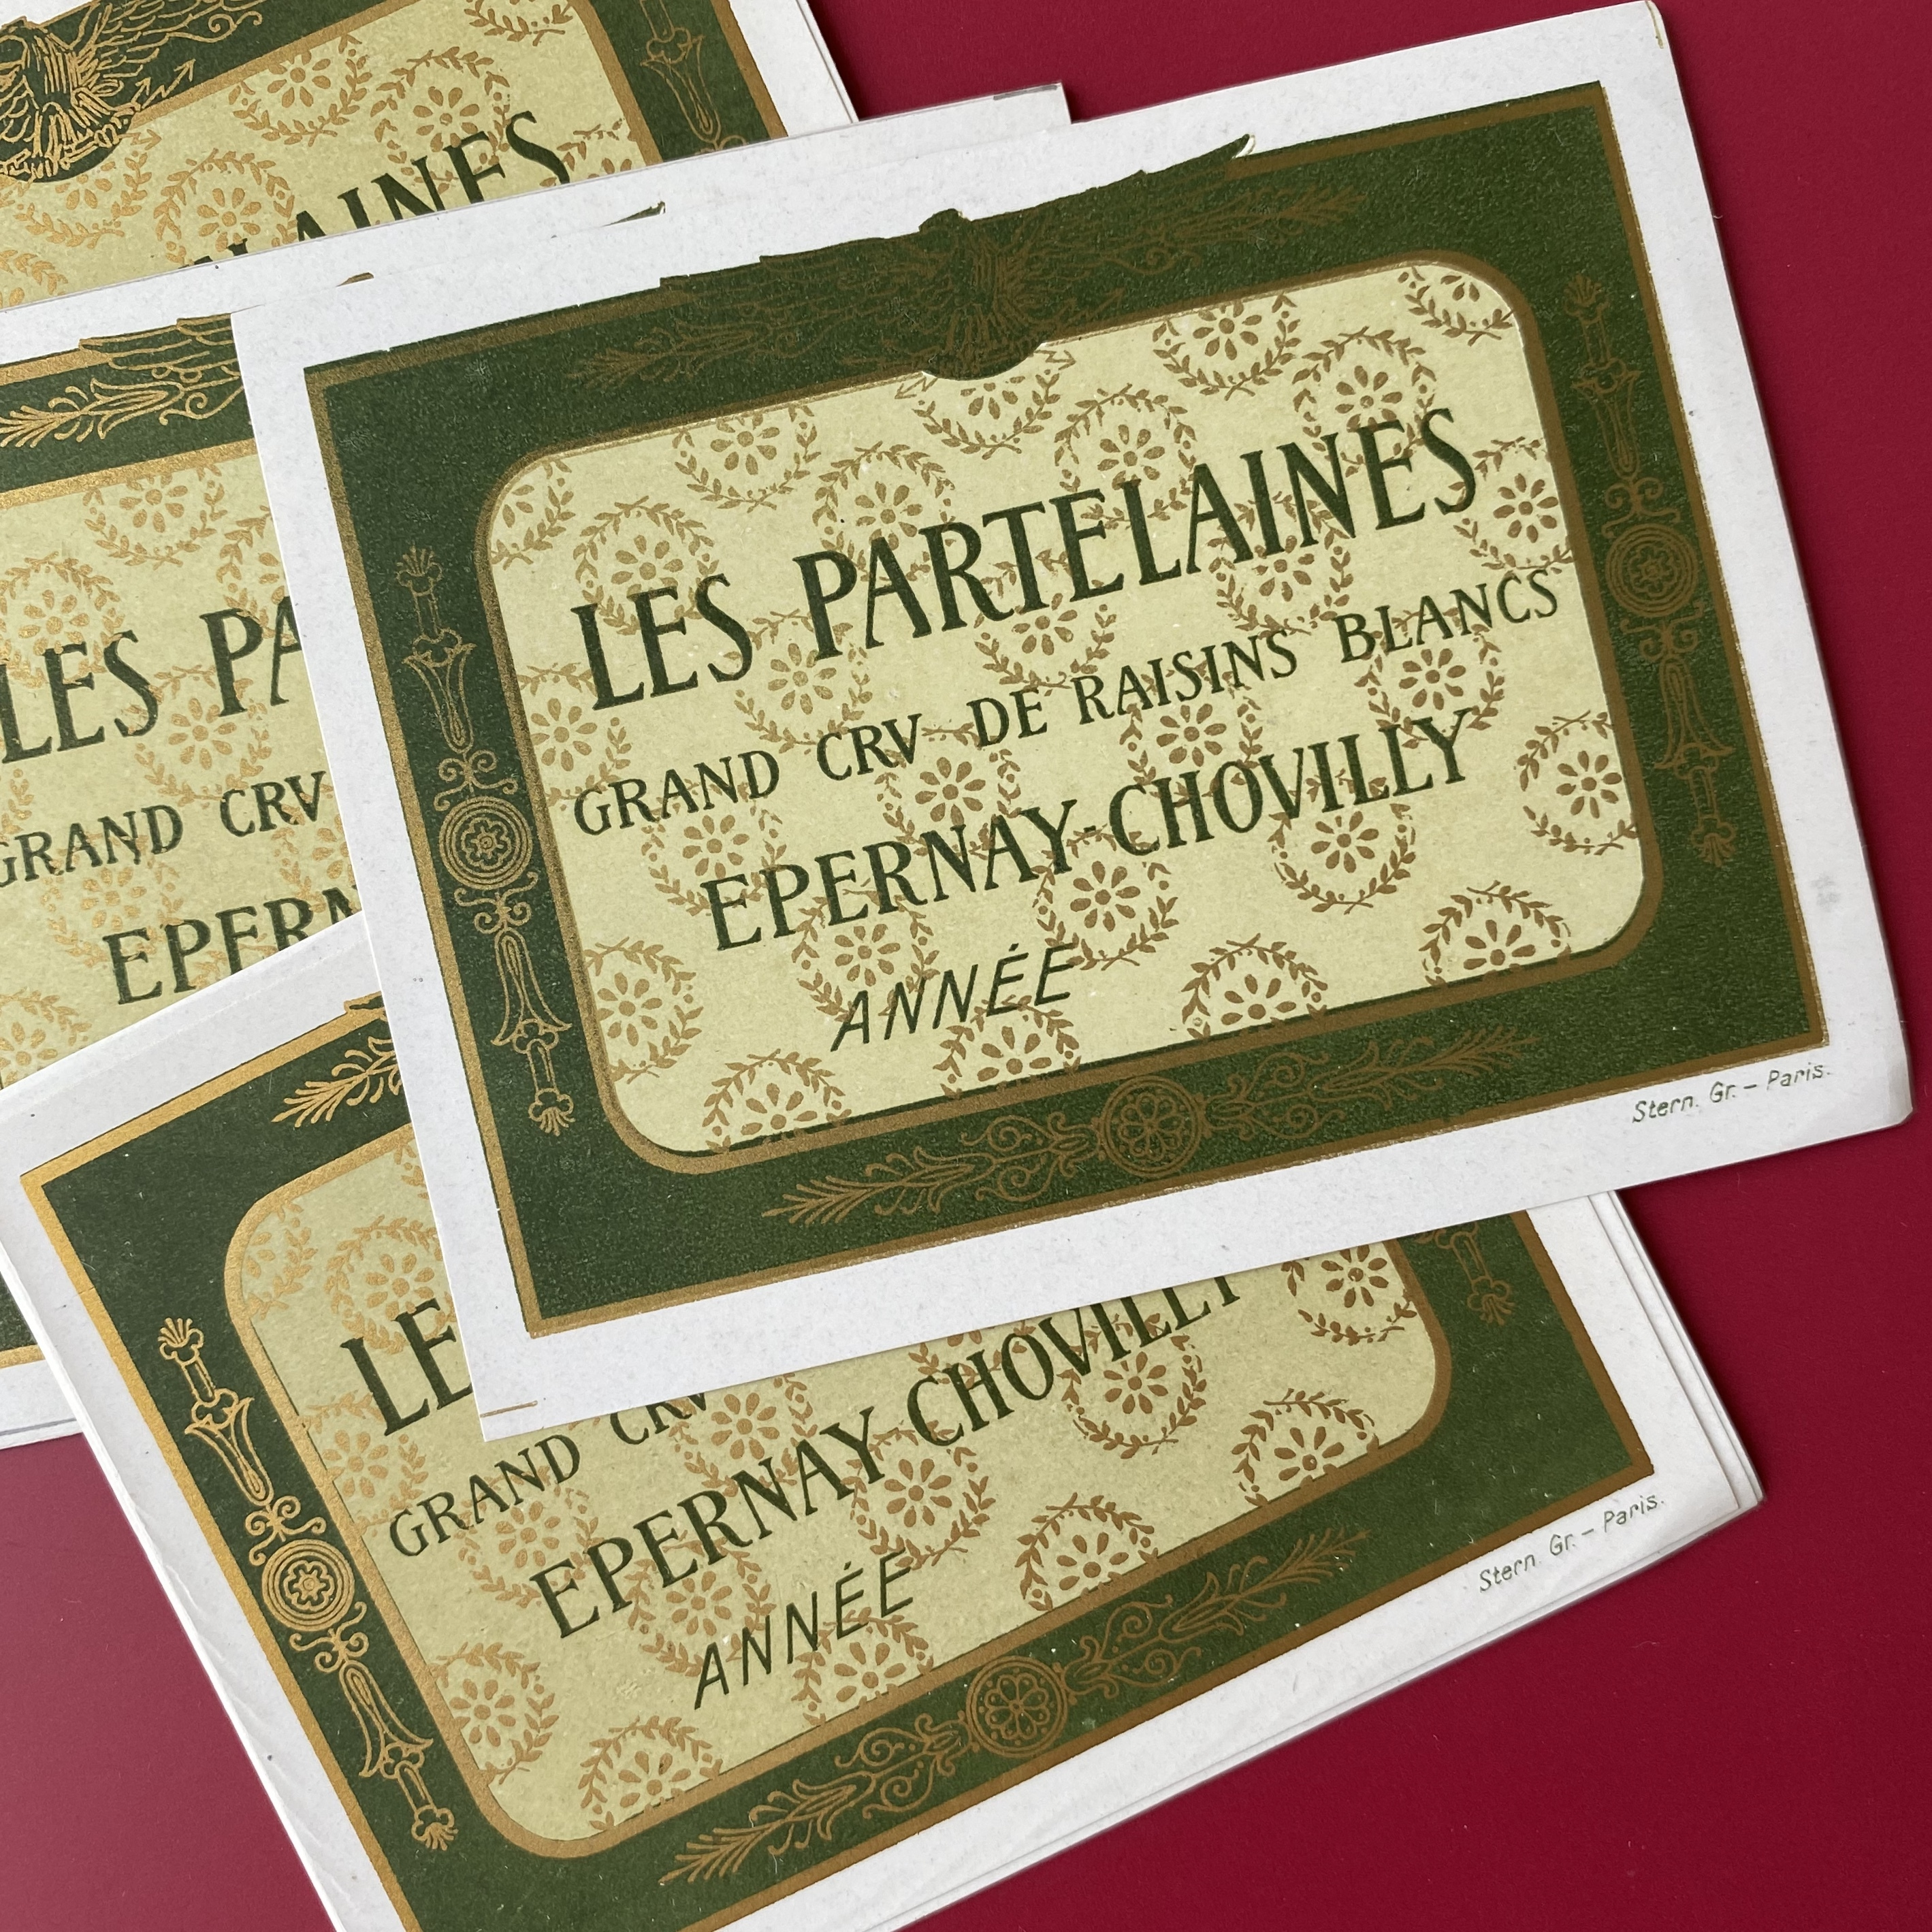 France アンティーク・アルコールラベル(LES PARTELAINES ) /  vp0088